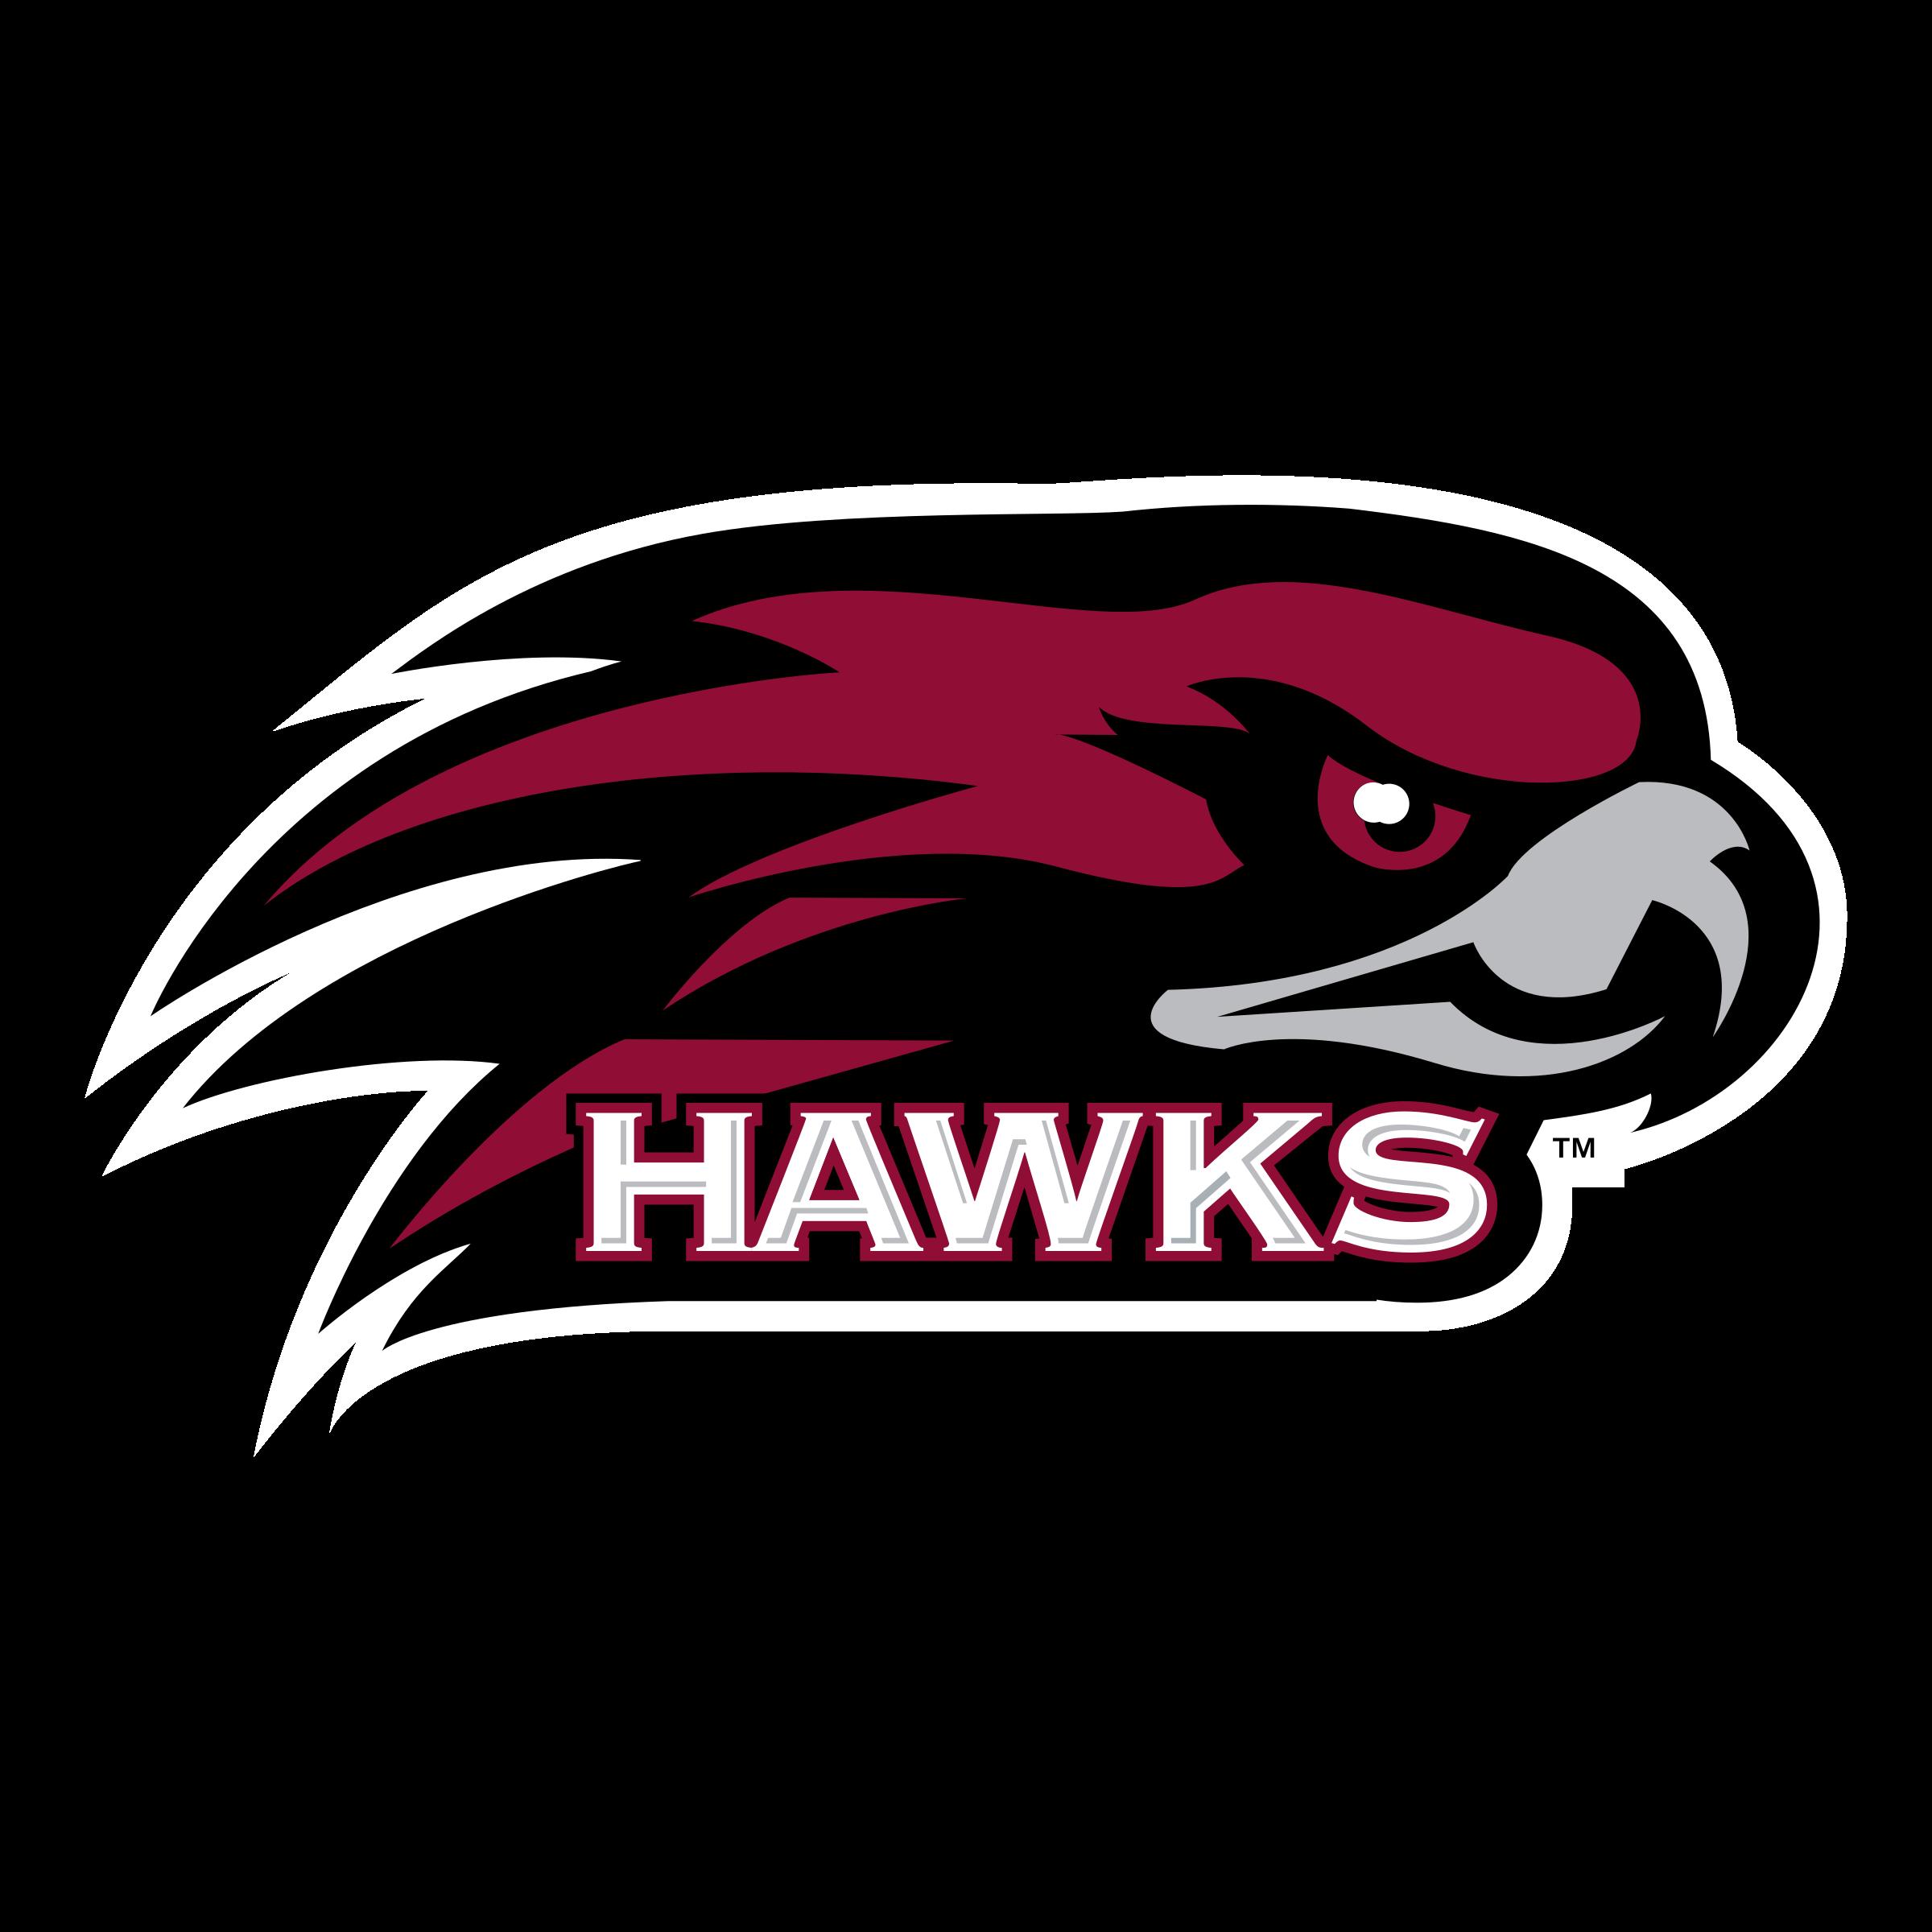 Saint Joseph's Hawks Logo PNG Transparent & SVG Vector.